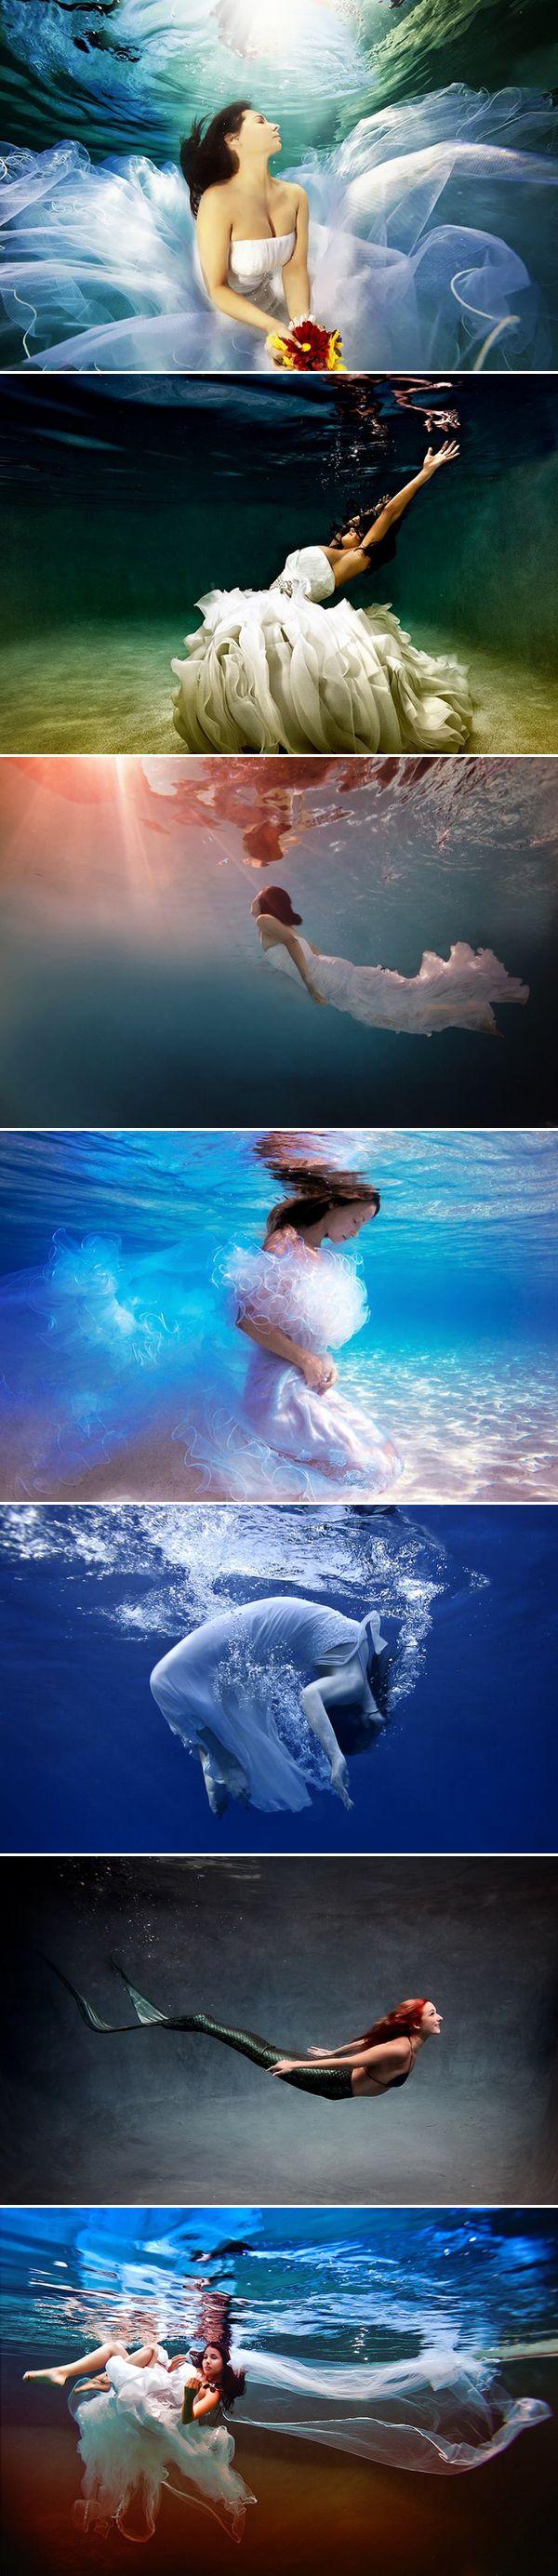 27 Beautiful Underwater Engagement Photos - Bridal portraits